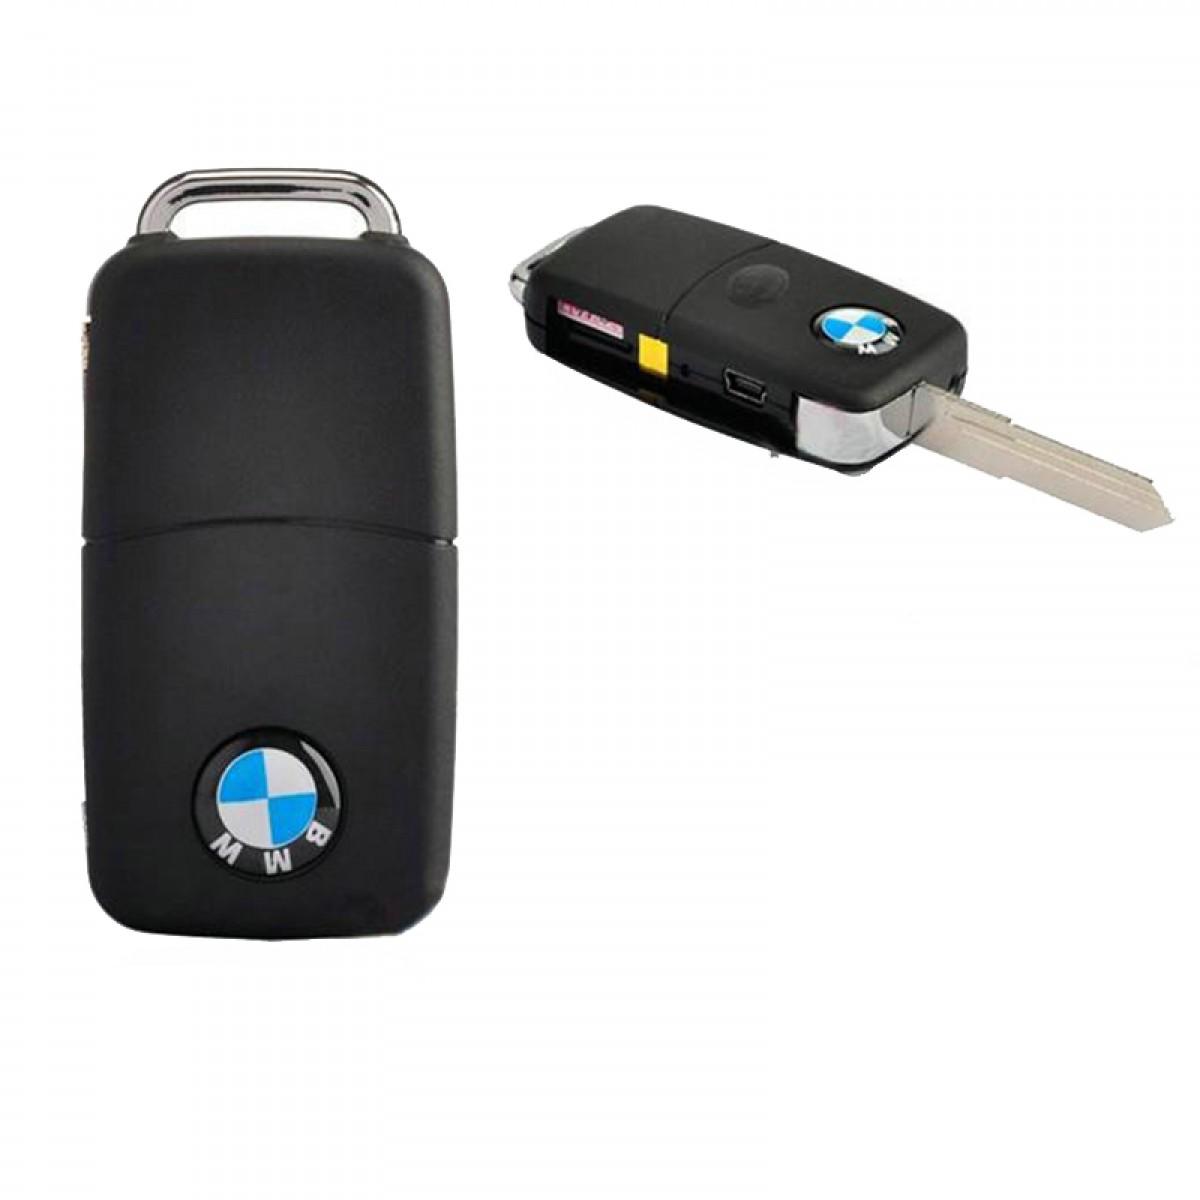 Mini Car Key BMW Spy Camera DVR – Κρυφή Κάμερα Κλειδί & USB Καλώδιο-OEM